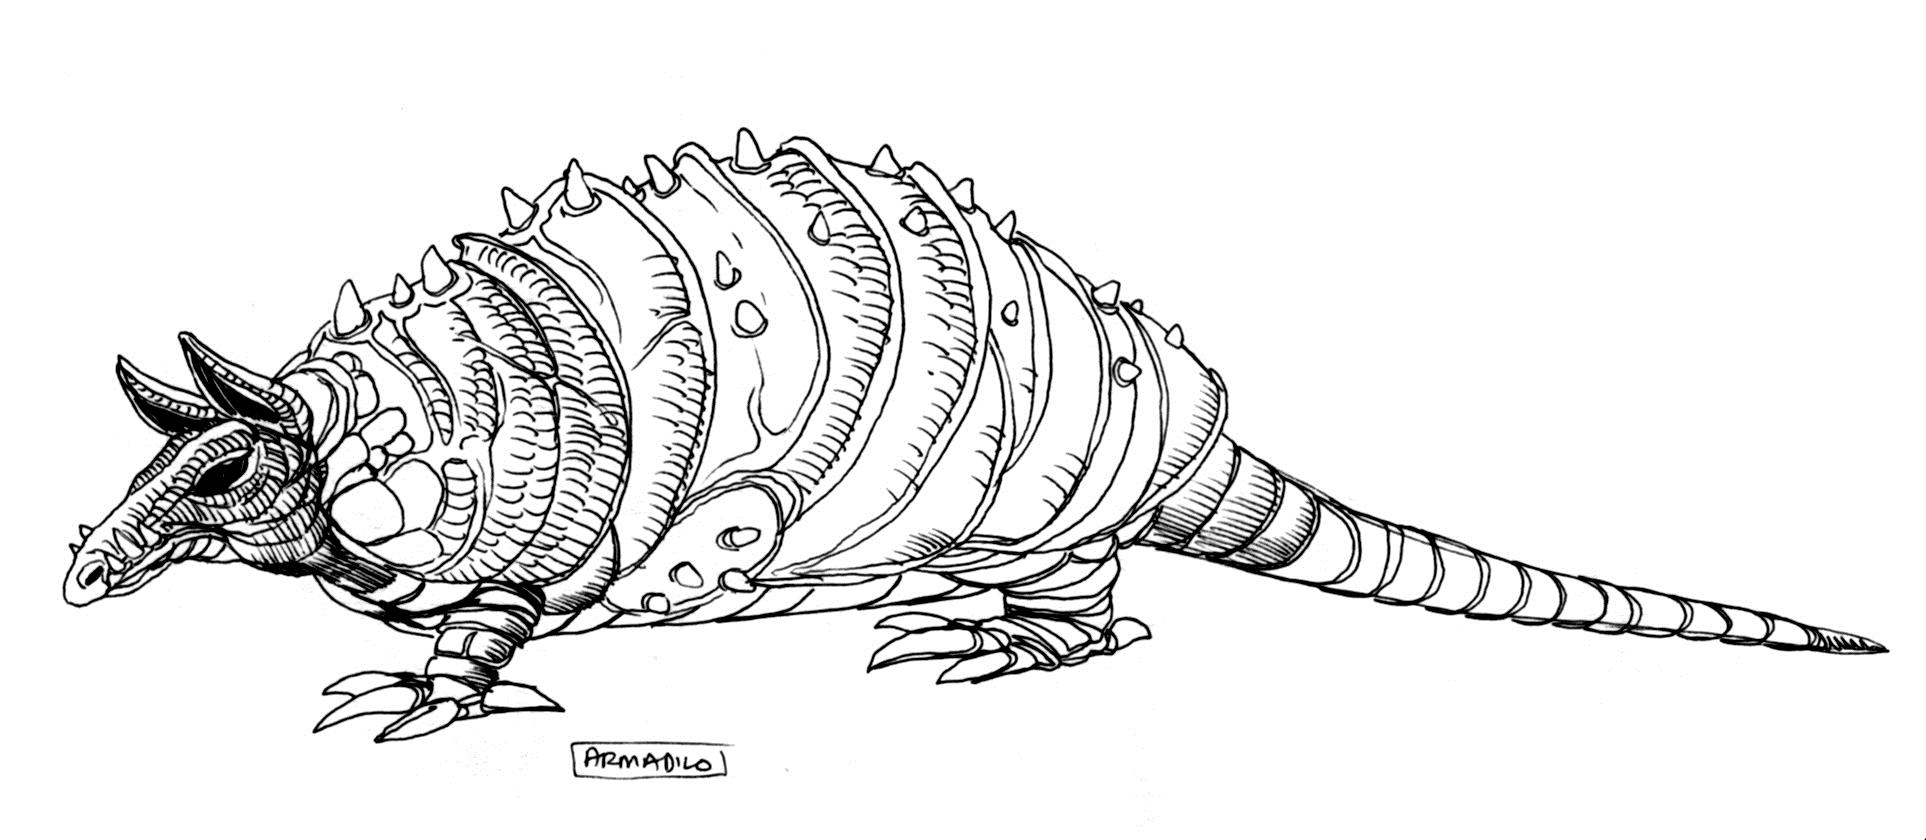 Броненосец (существо)